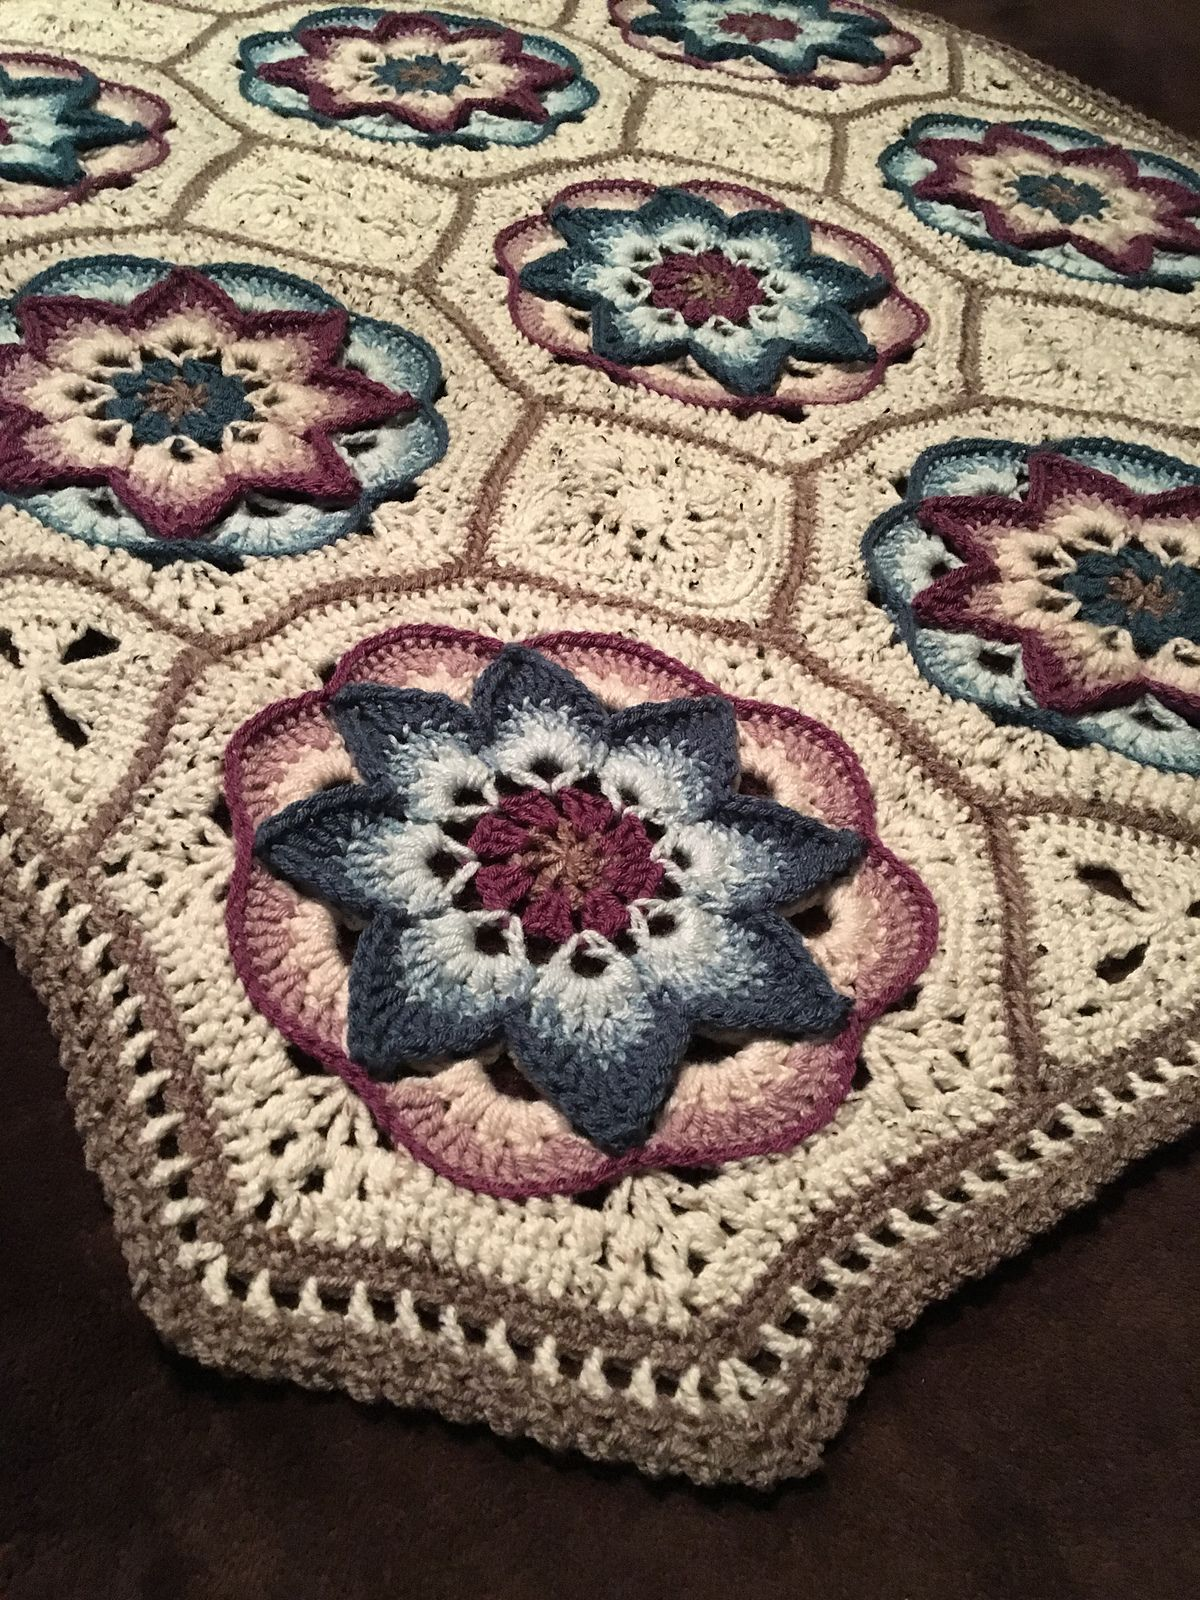 Ravelry: janmbwhite\'s Lotus Moon Tiles 2 | Needle work | Pinterest ...